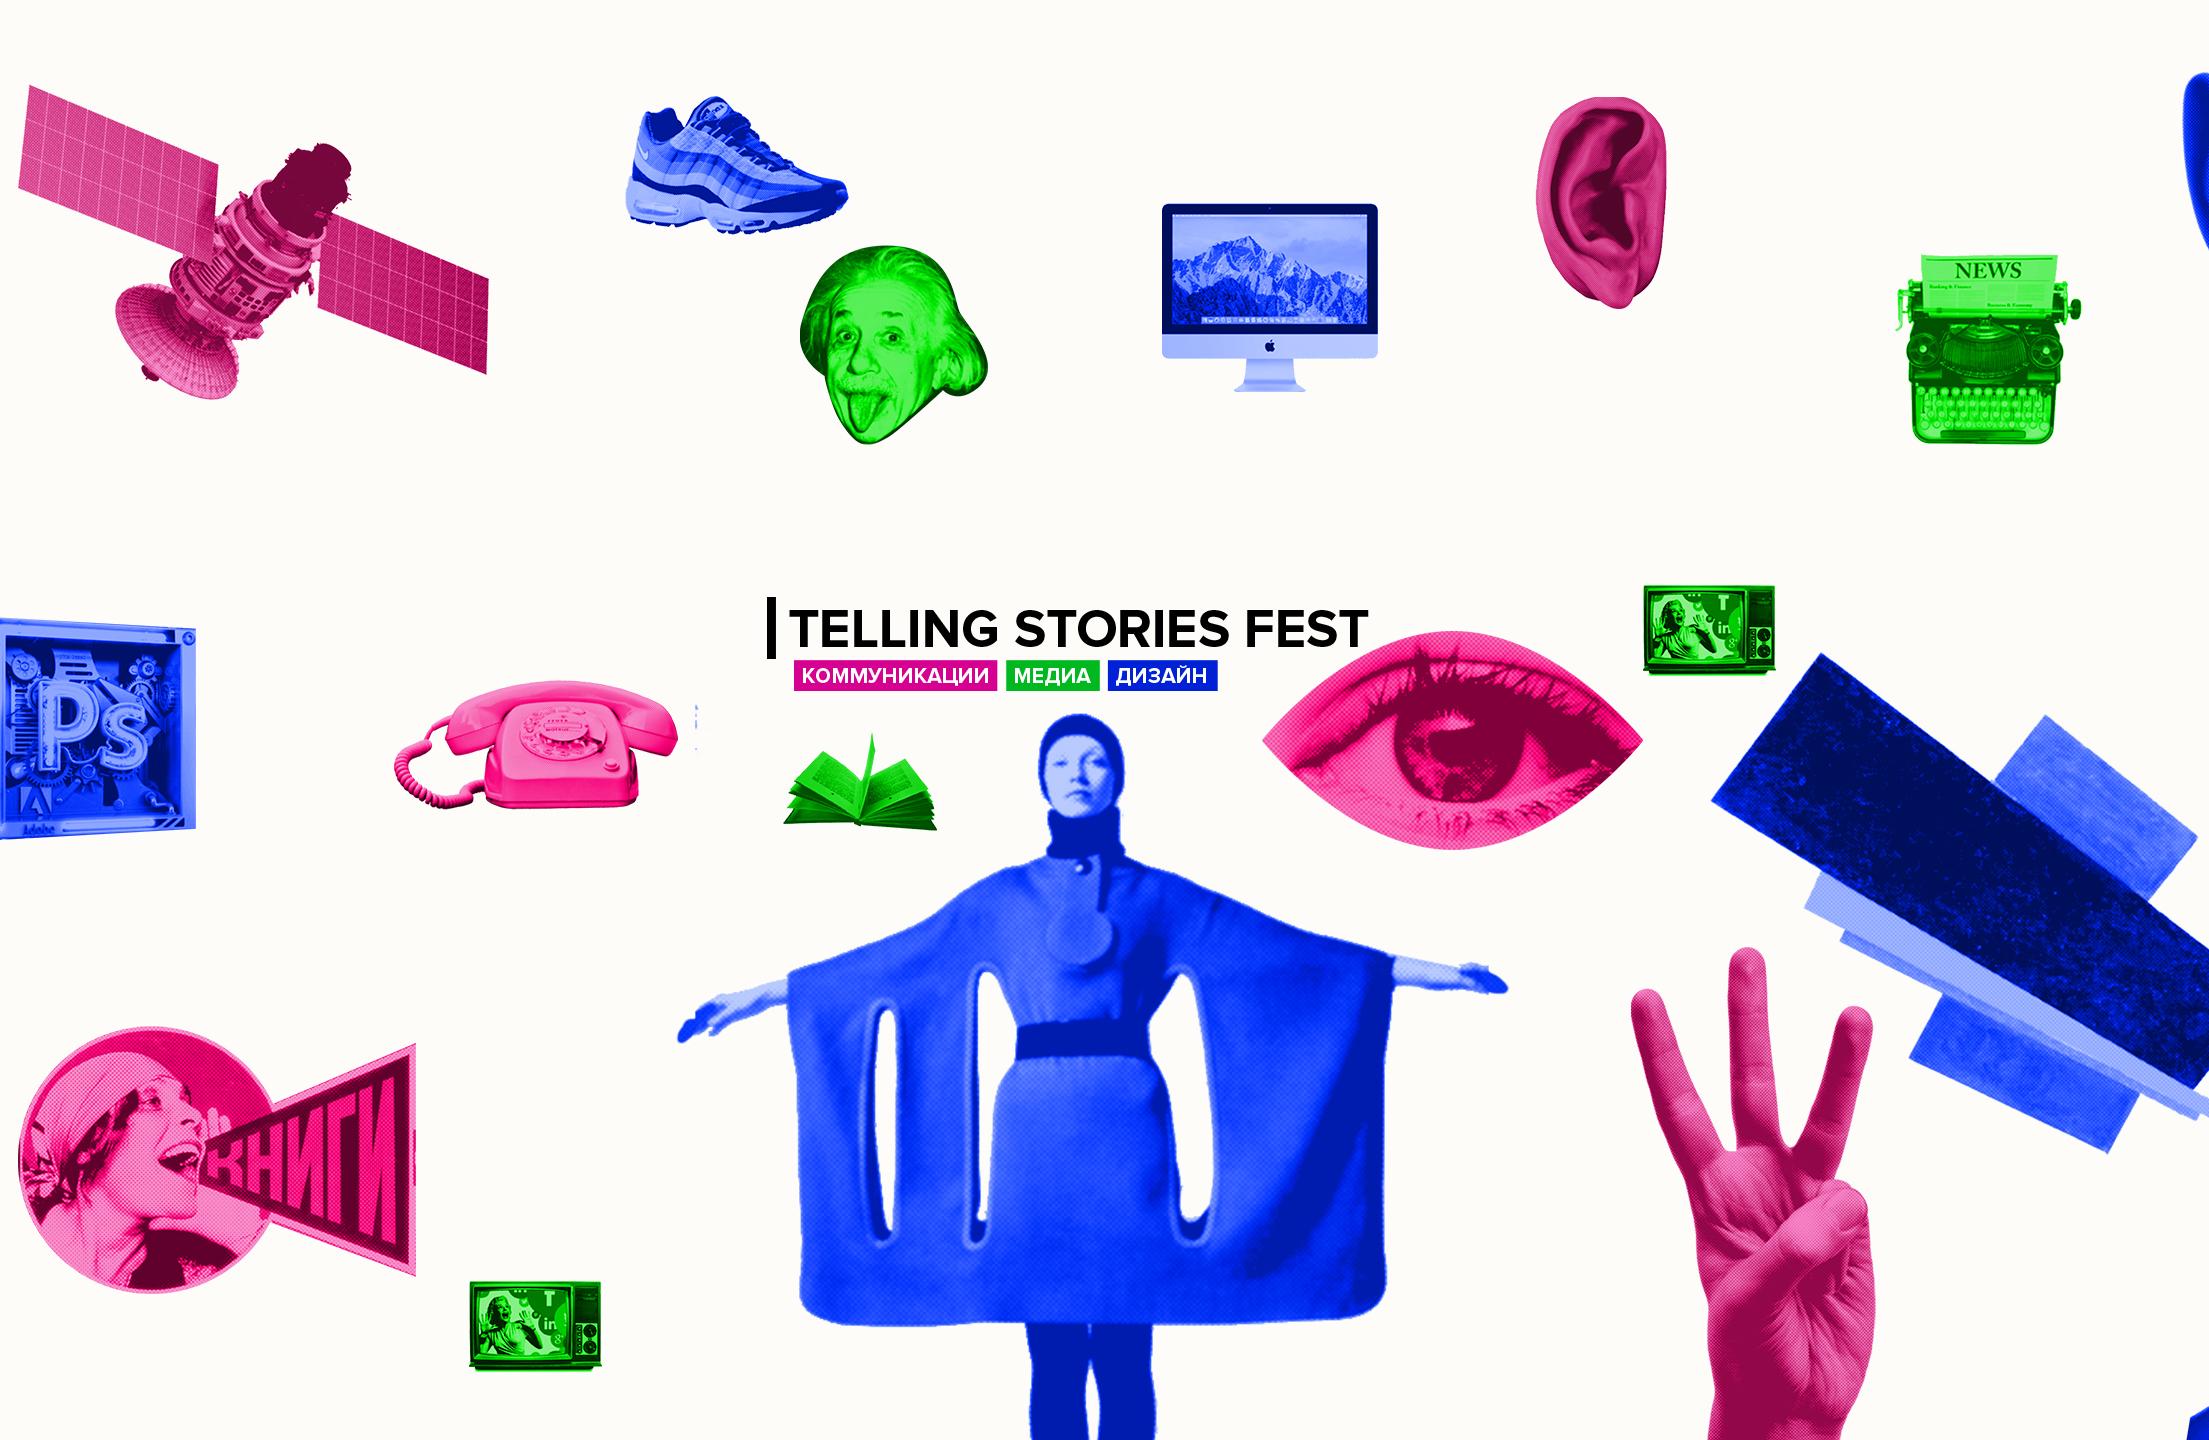 Объявлены хэдлайнеры фестиваля Telling Stories 2019